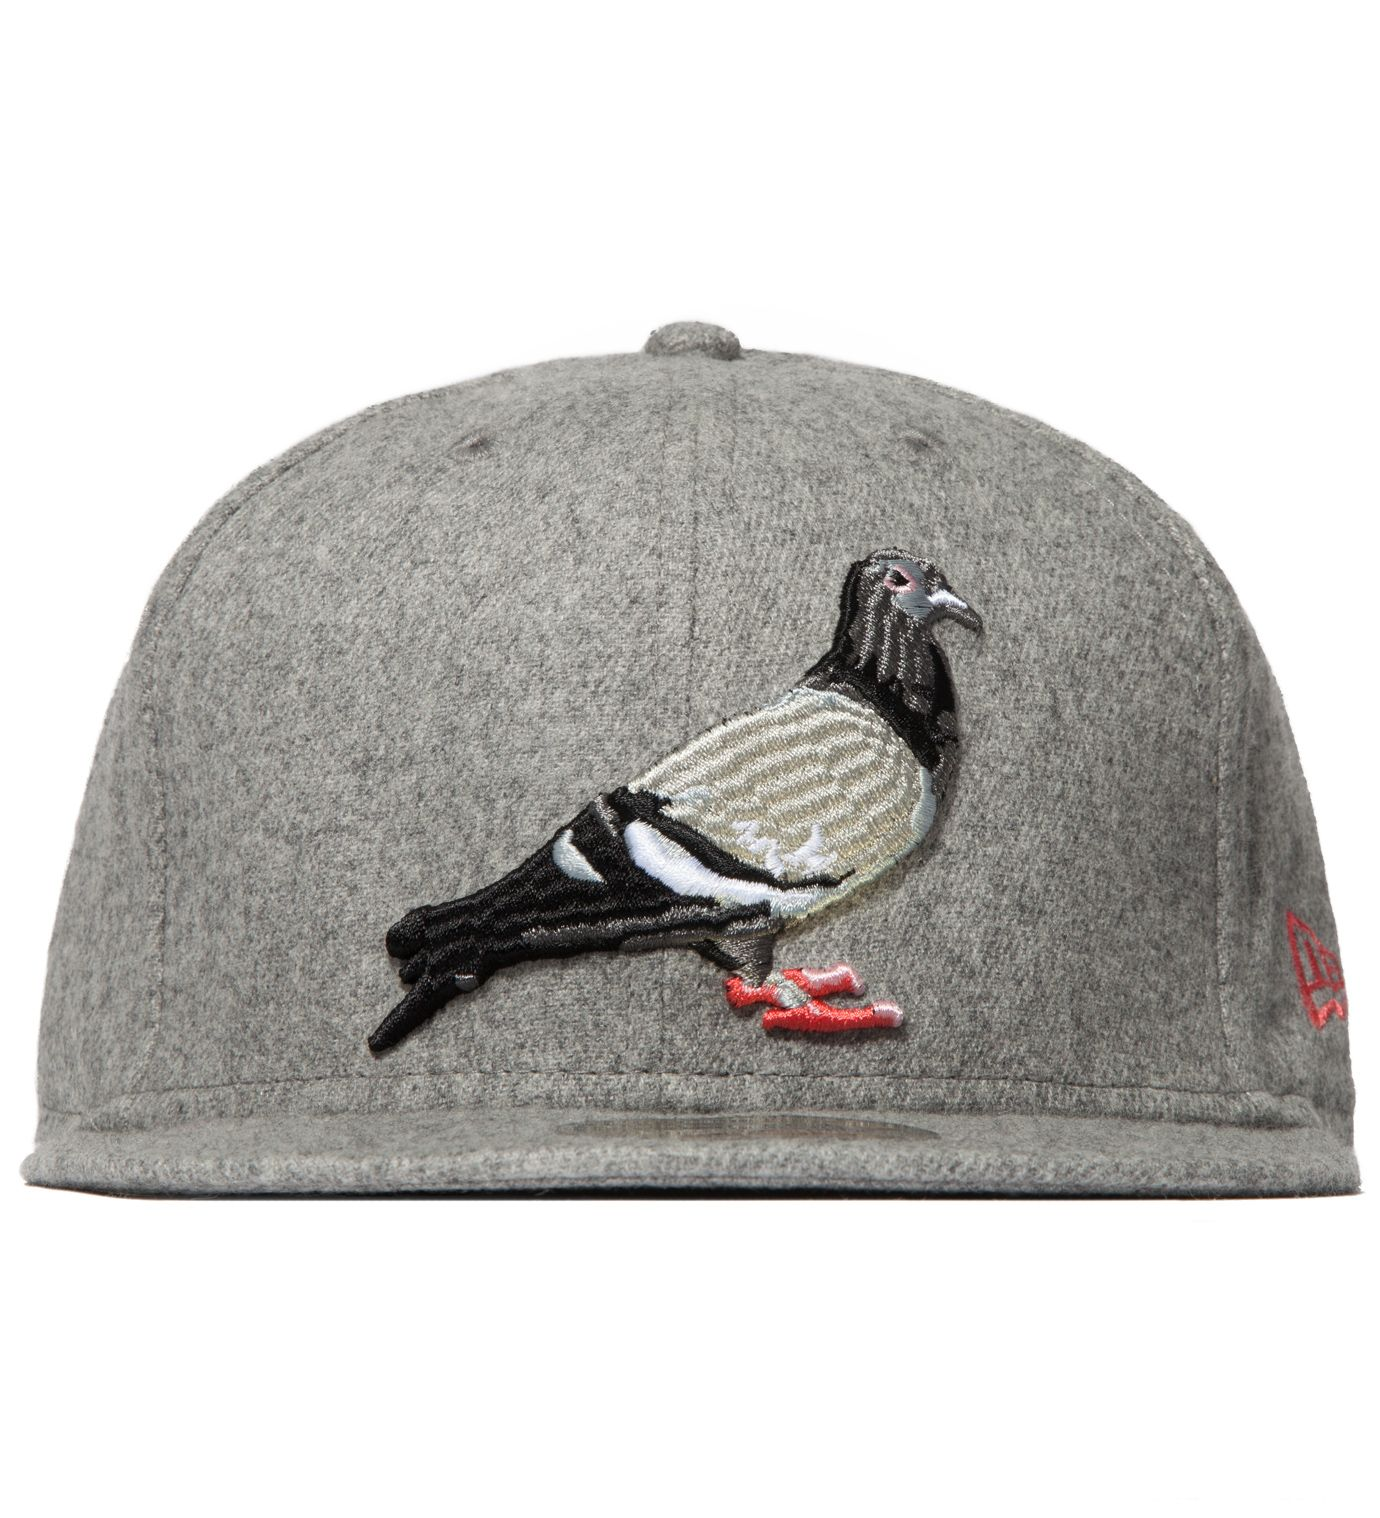 (Big City eagle) Heather Grey Pigeon Fitted New Era Cap e9d713b03df